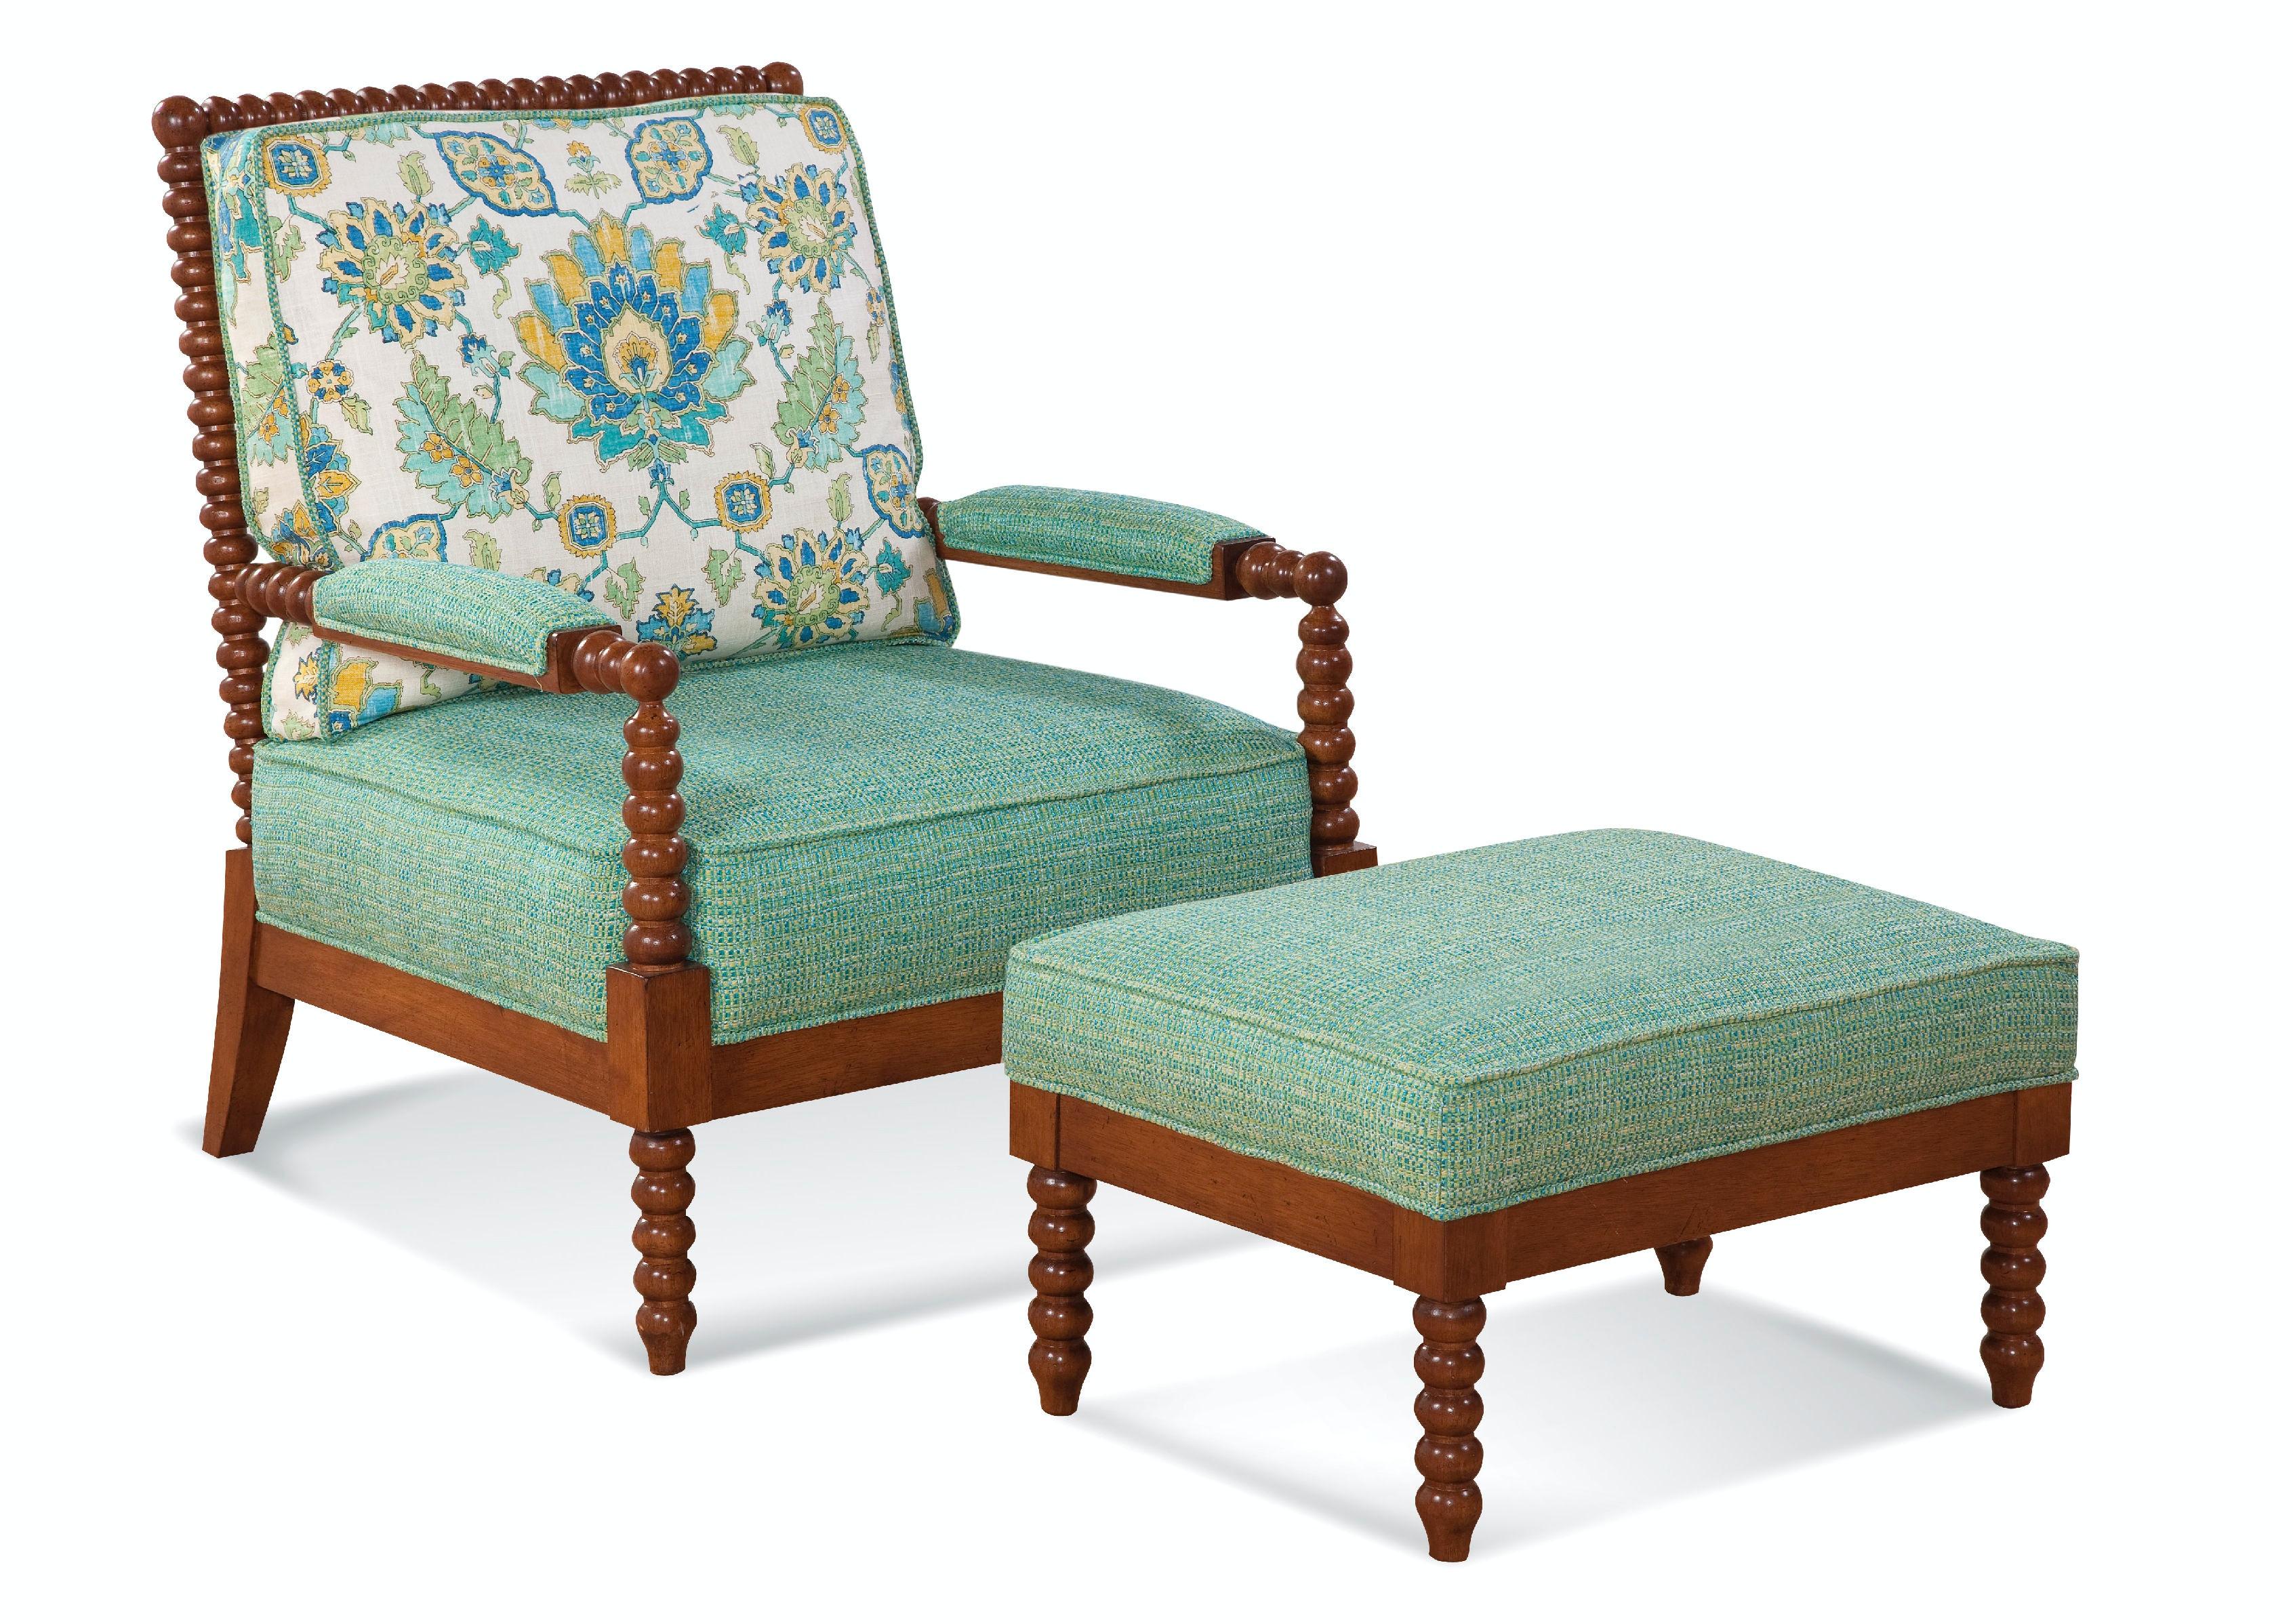 Attrayant Braxton Culler Lind Island Lounge Chair 1046 001